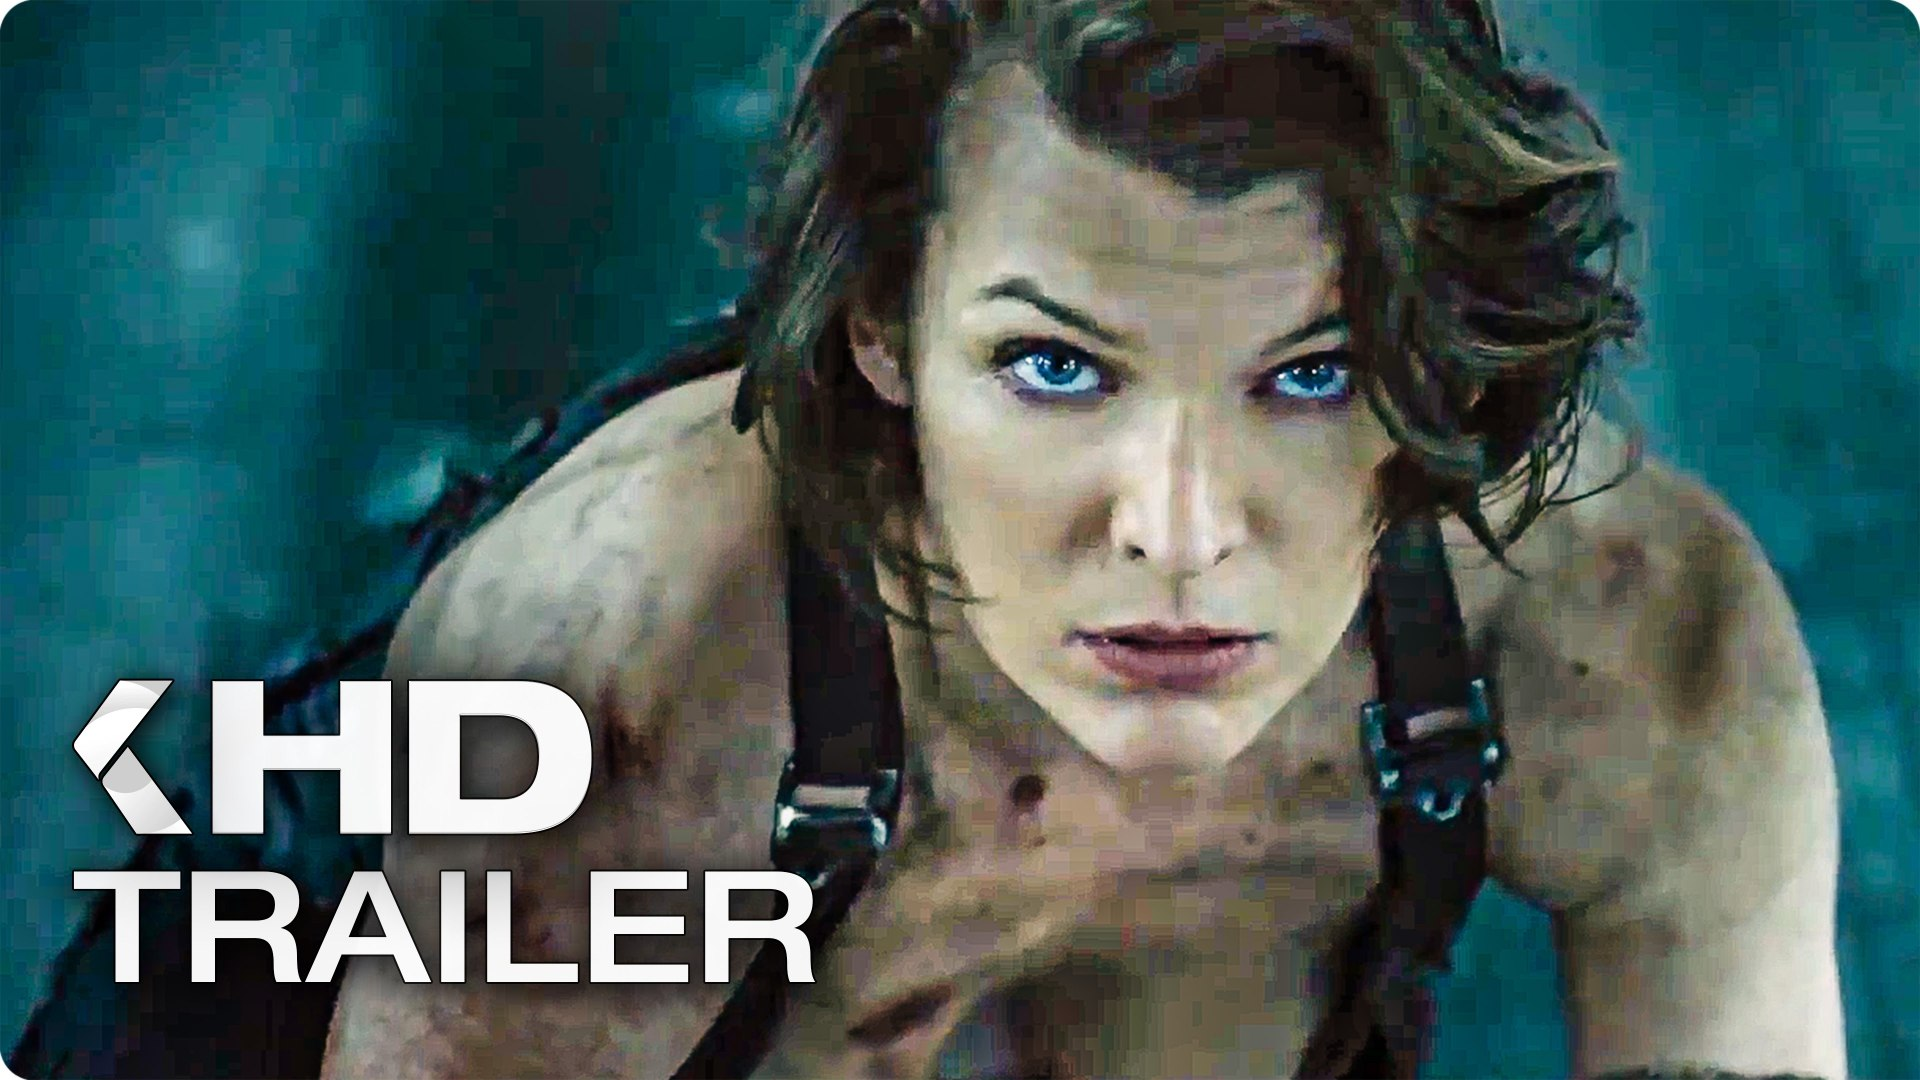 Resident Evil The Final Chapter Trailer - Resident Evil 6: The Final Chapter Trailer (2017)